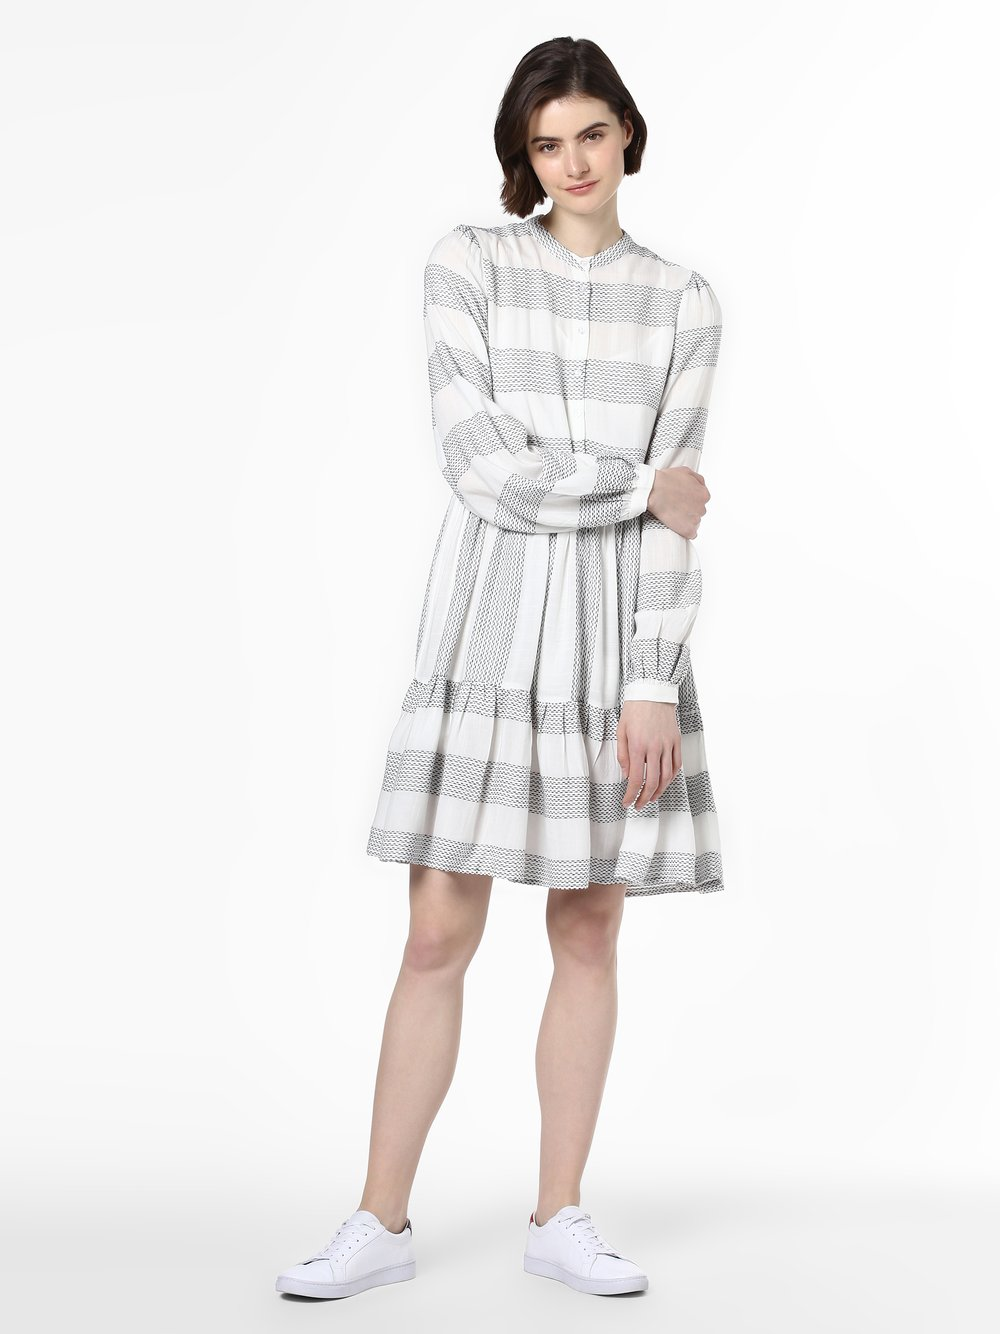 Y.A.S – Sukienka damska – Yaslamali, beżowy Van Graaf 469181-0001-09960